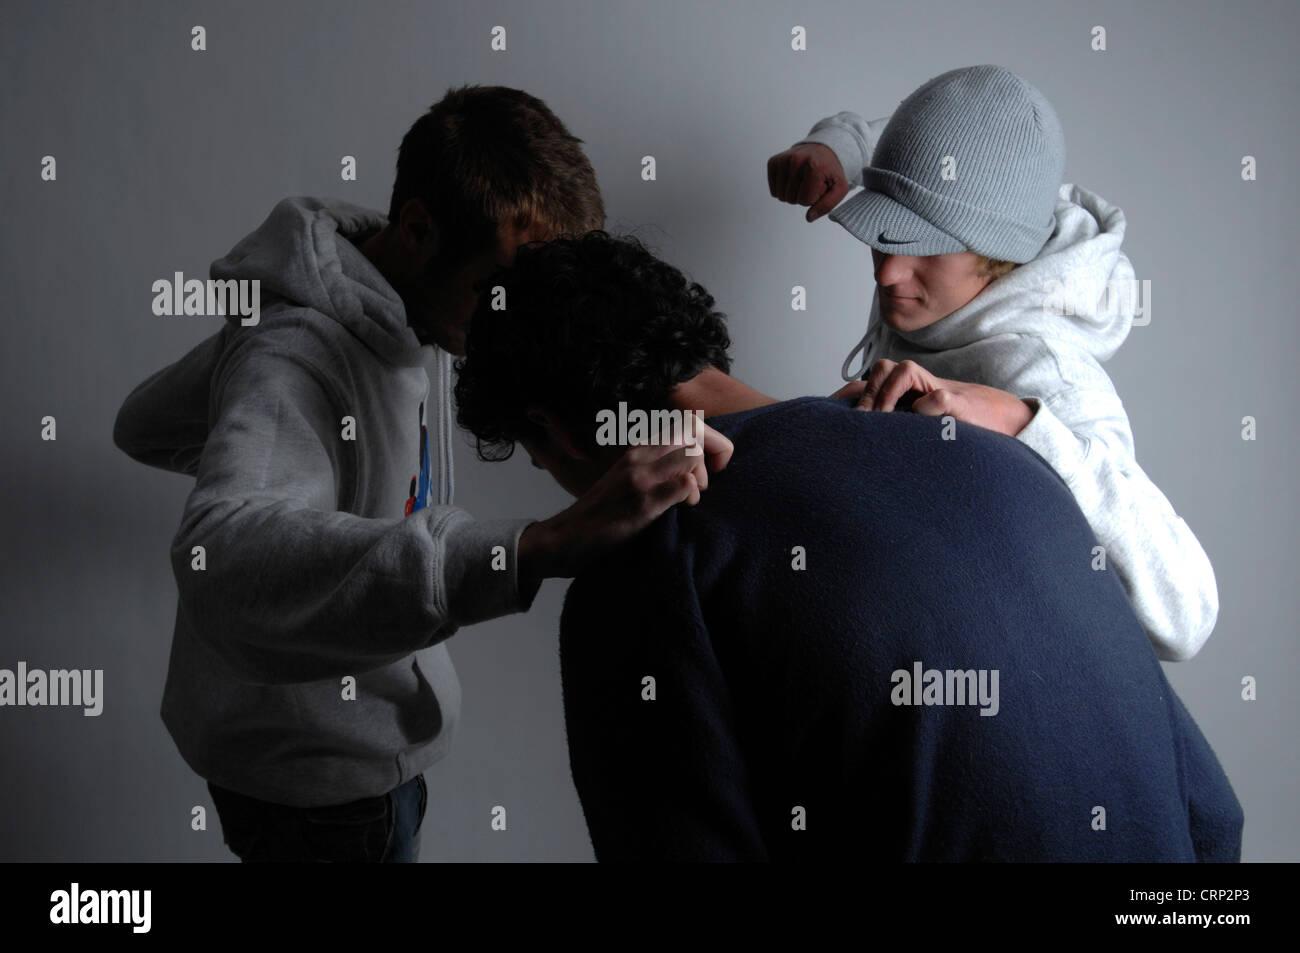 Dos hombres jóvenes apalear a un hombre joven Imagen De Stock